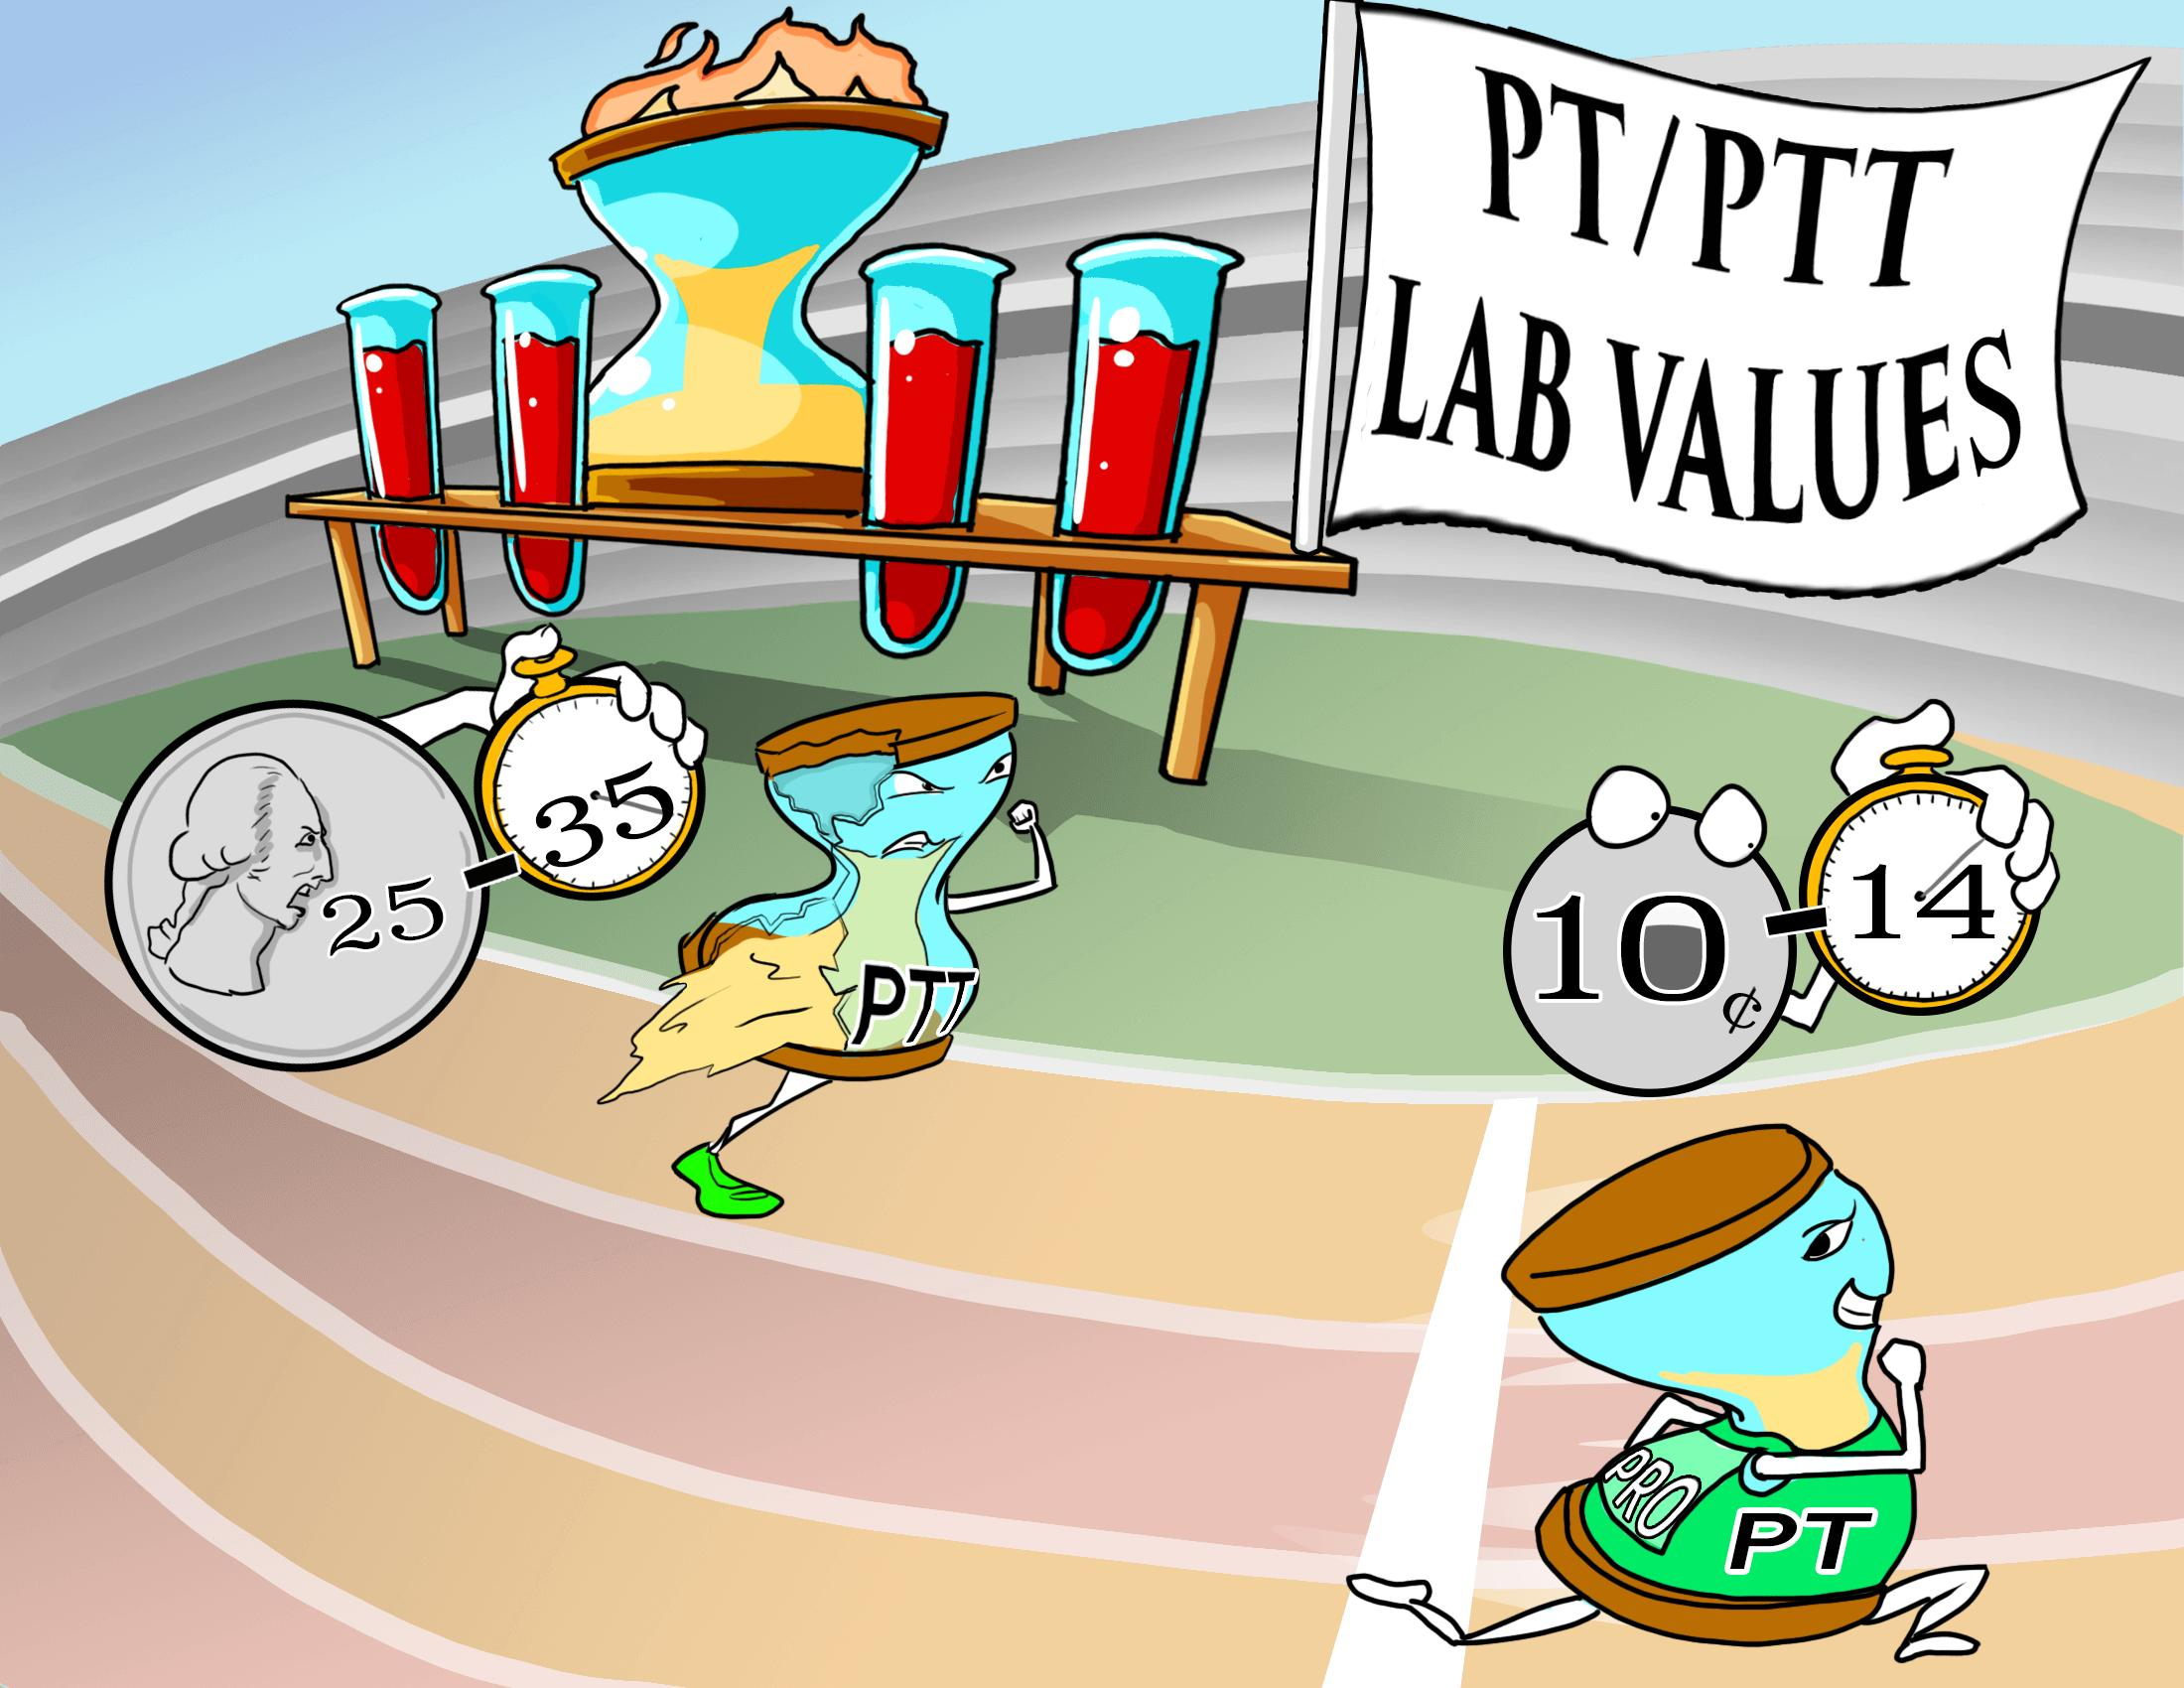 PT/PTT Lab Values